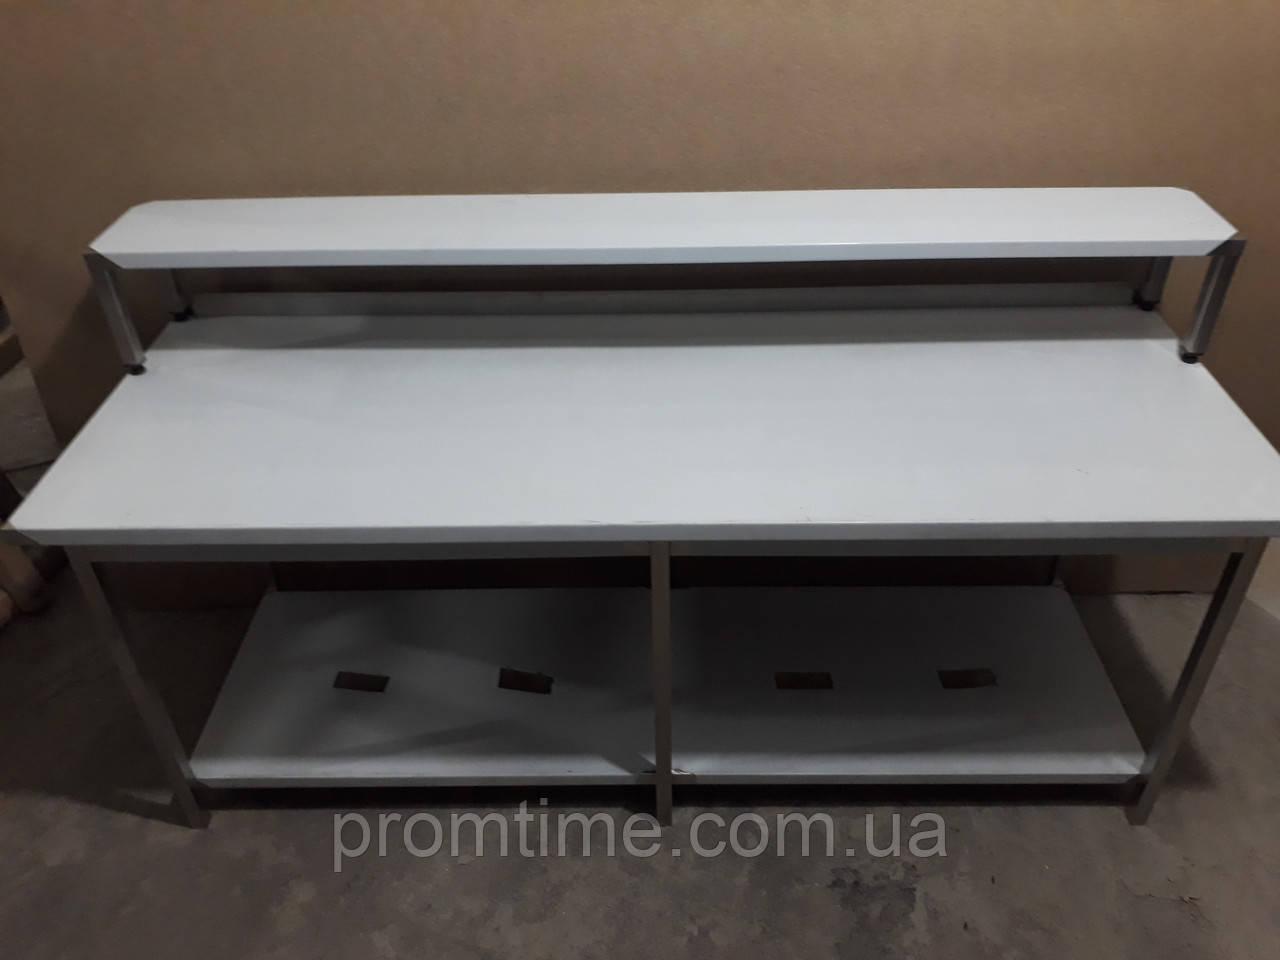 Стол производственный c полкой-надстройкой 2000х600х1050